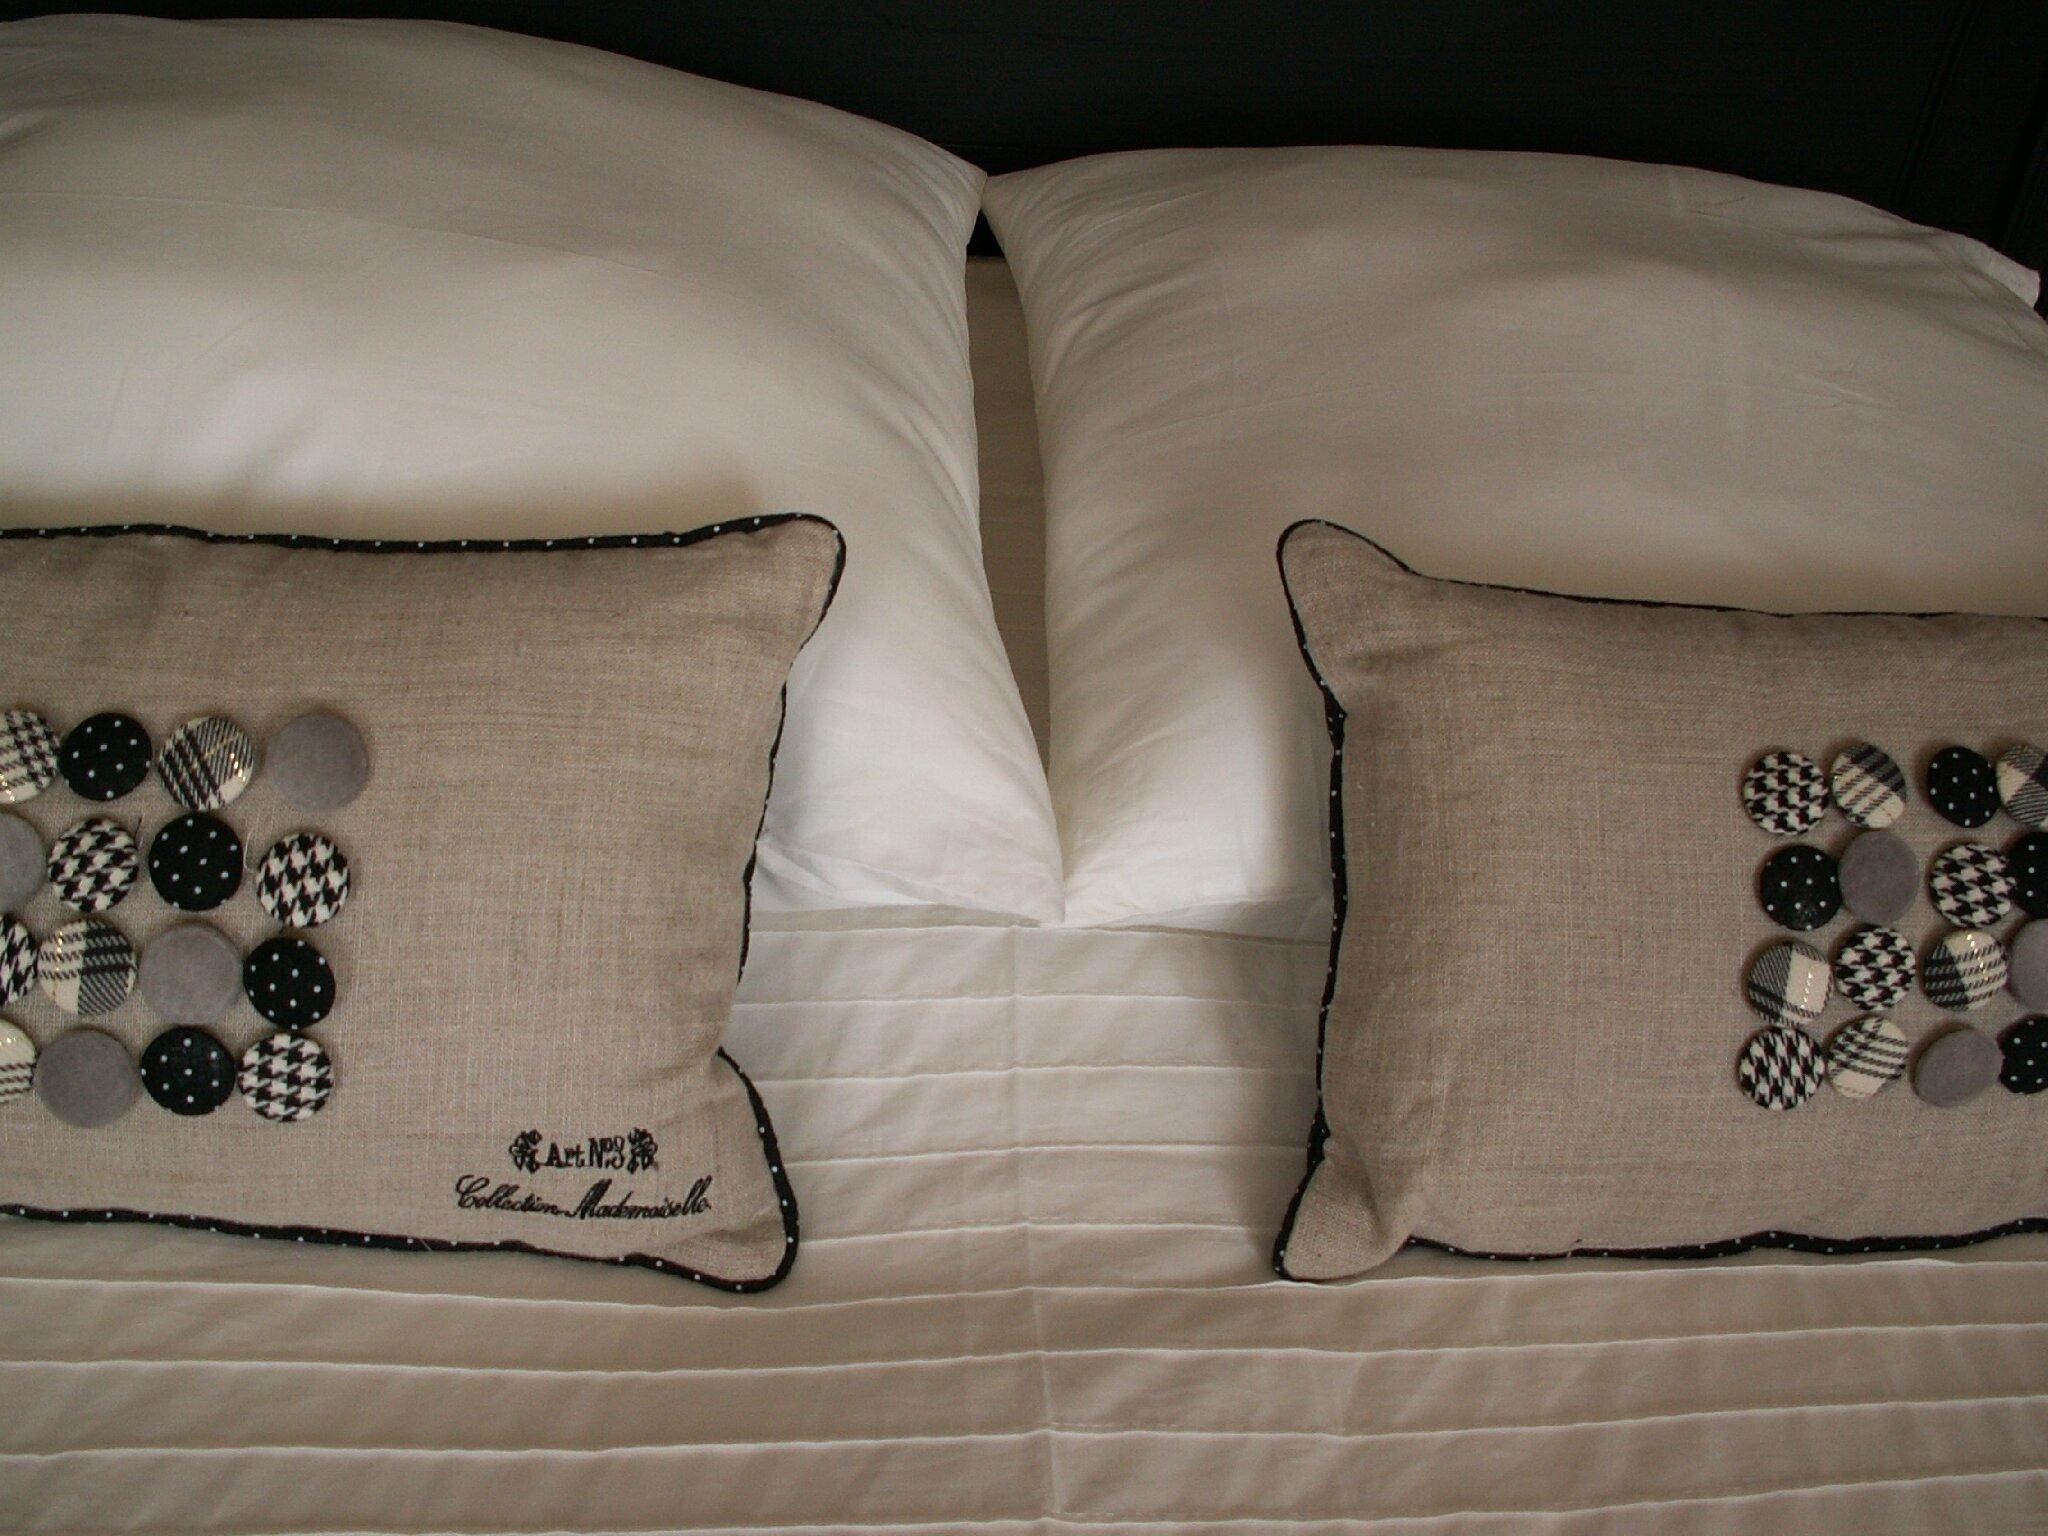 buis et hortensias. Black Bedroom Furniture Sets. Home Design Ideas